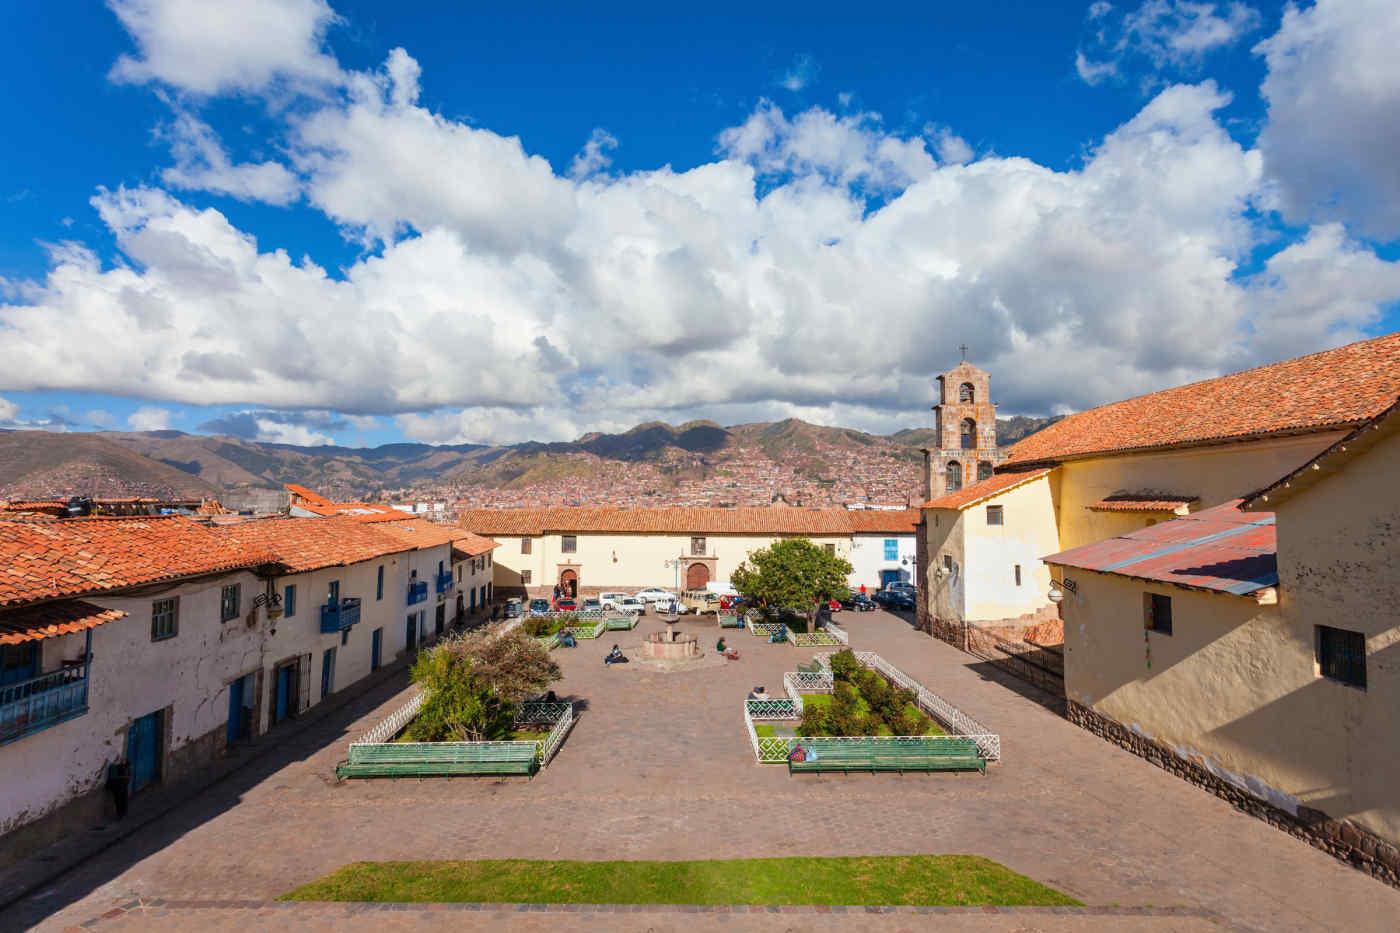 San Blas in Cusco